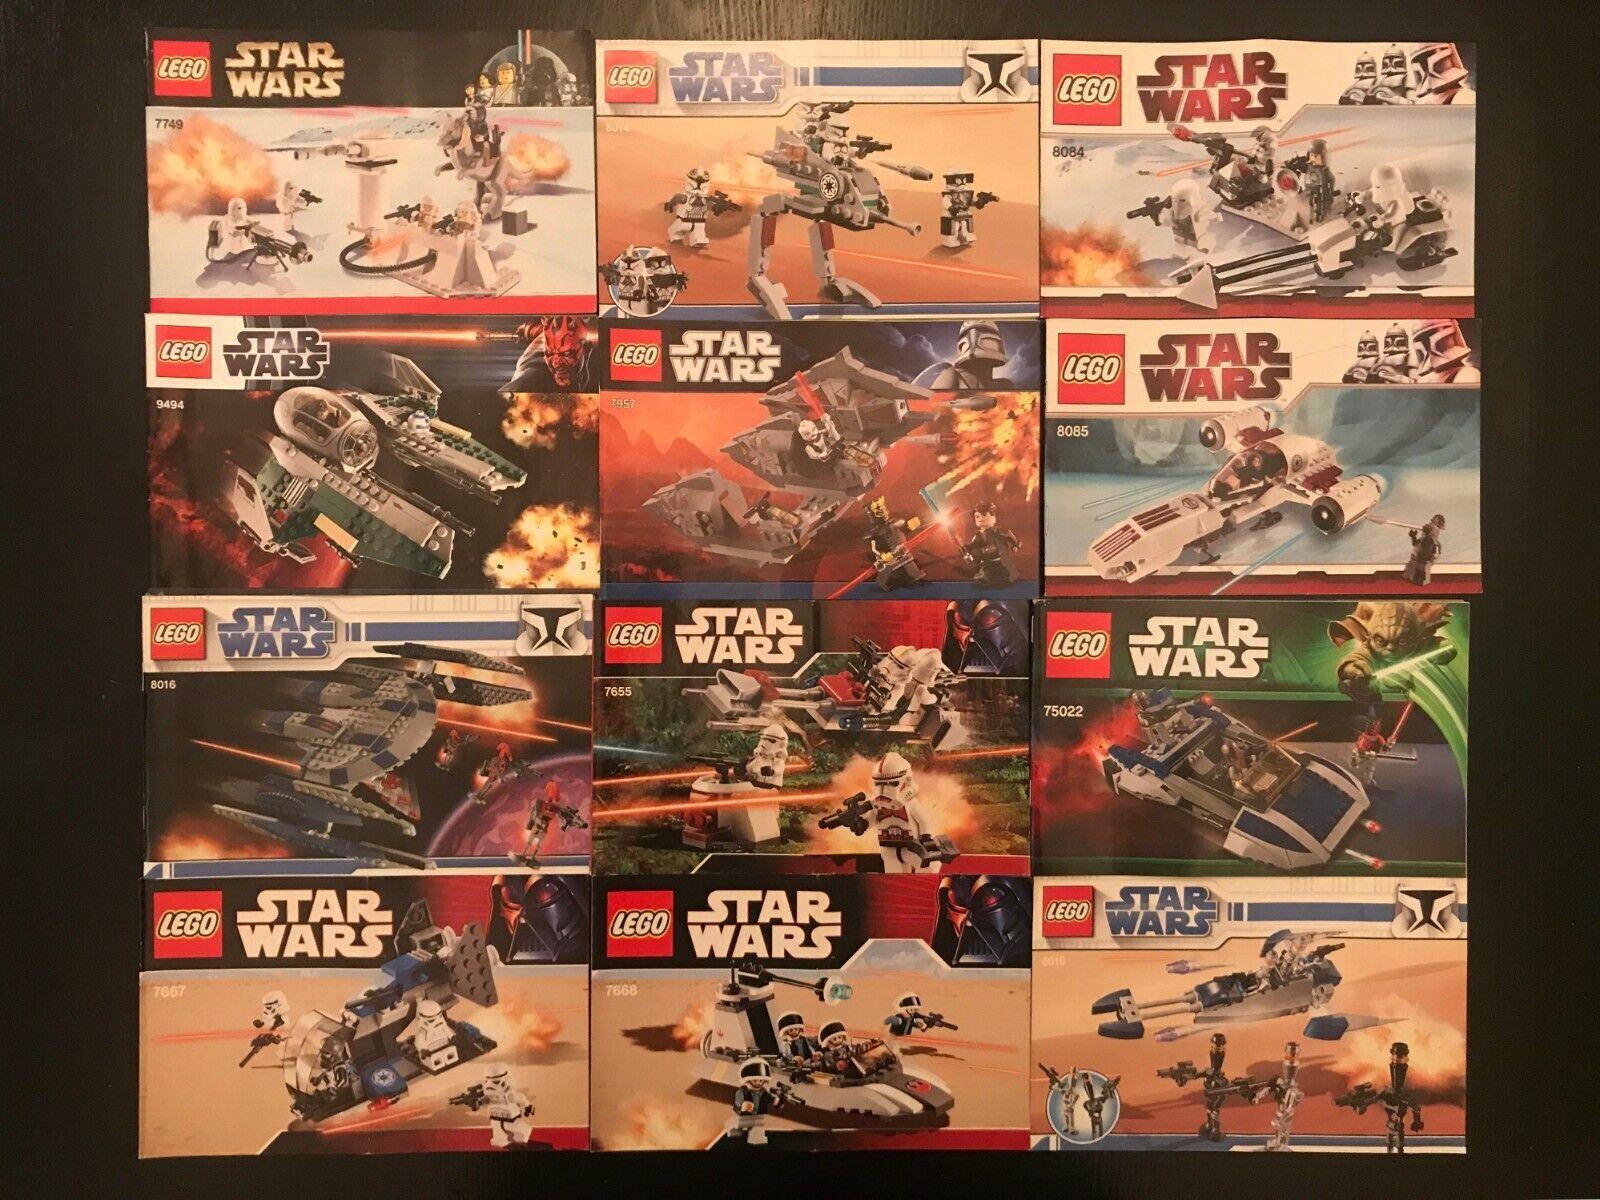 LEGO Star Wars Instruction Manual LOT 8016 9494 7957 7670 8018 8128 7669 & More